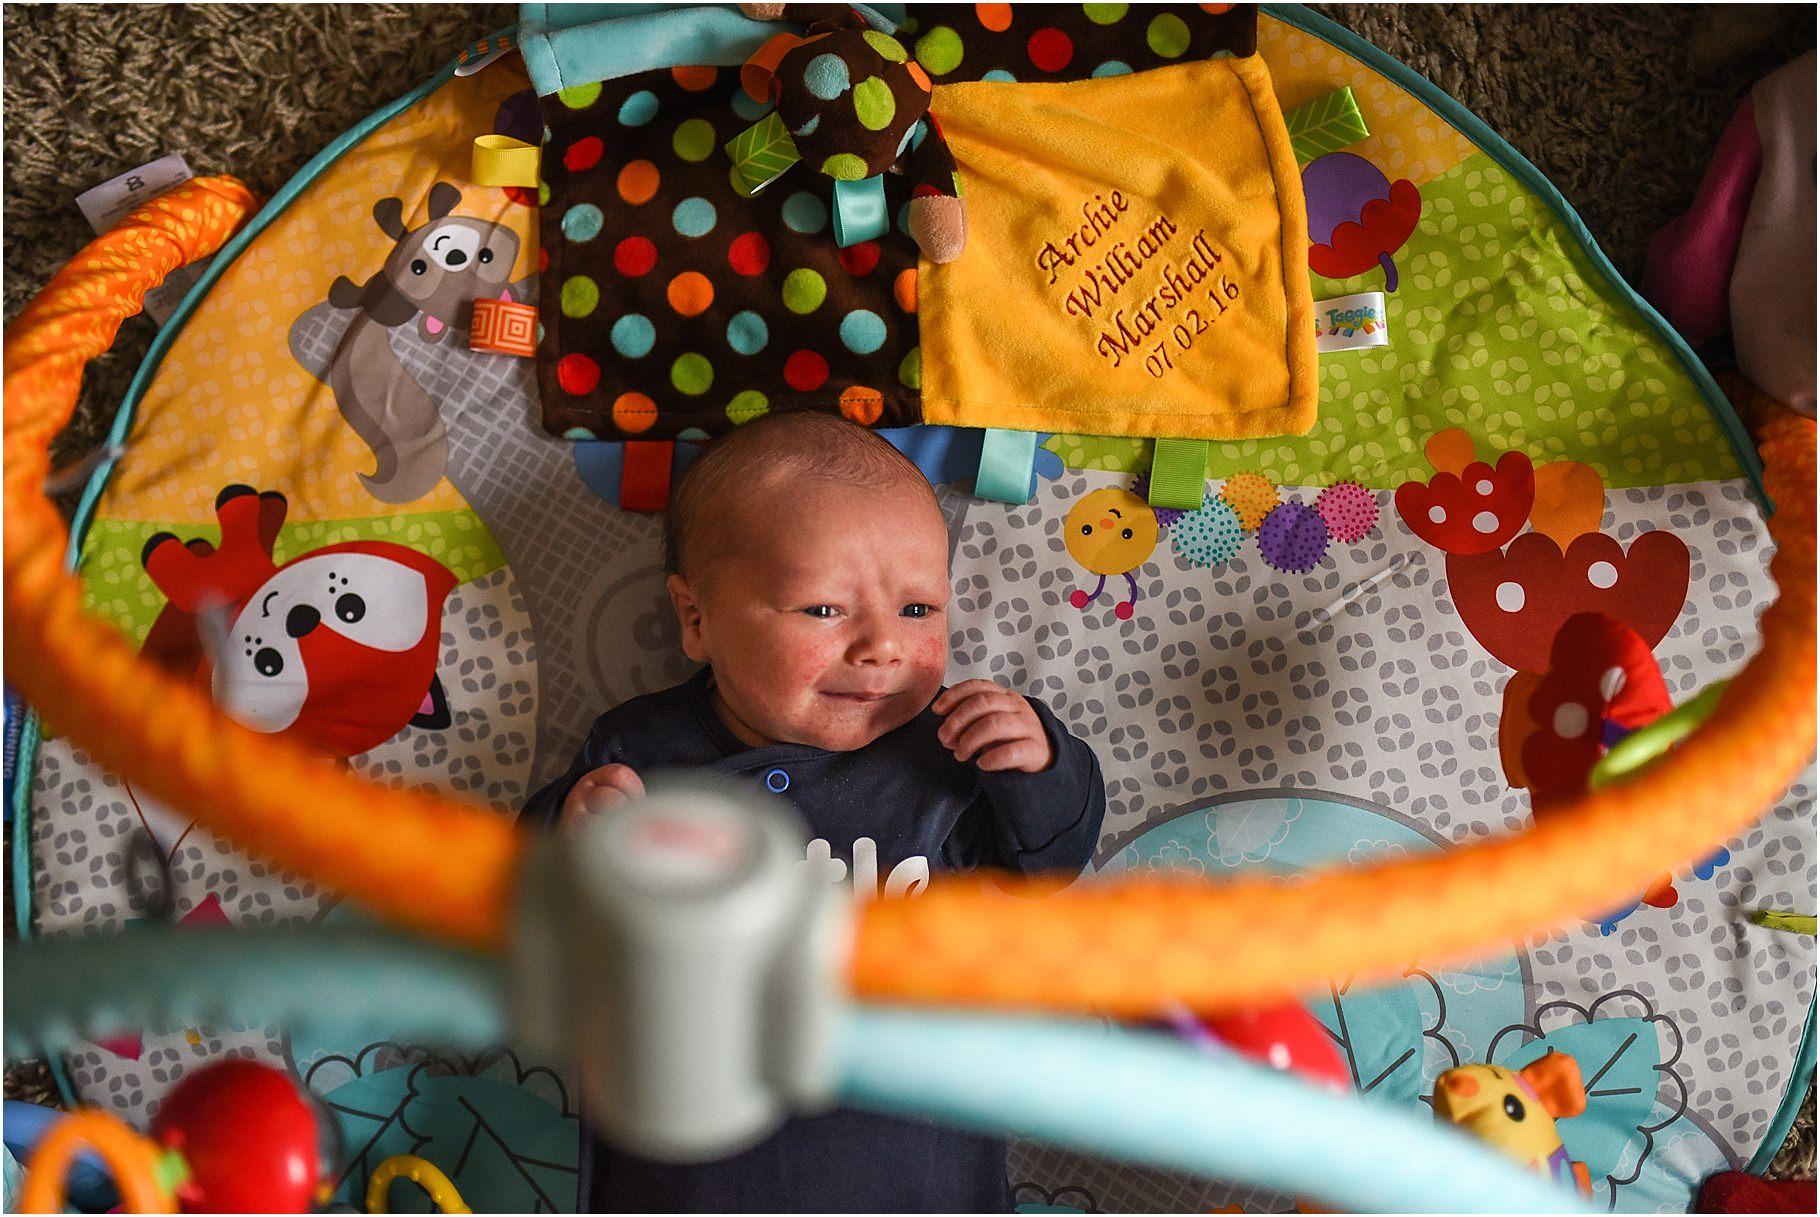 lancashire-family-portraits-documentary-newborn-44.jpg